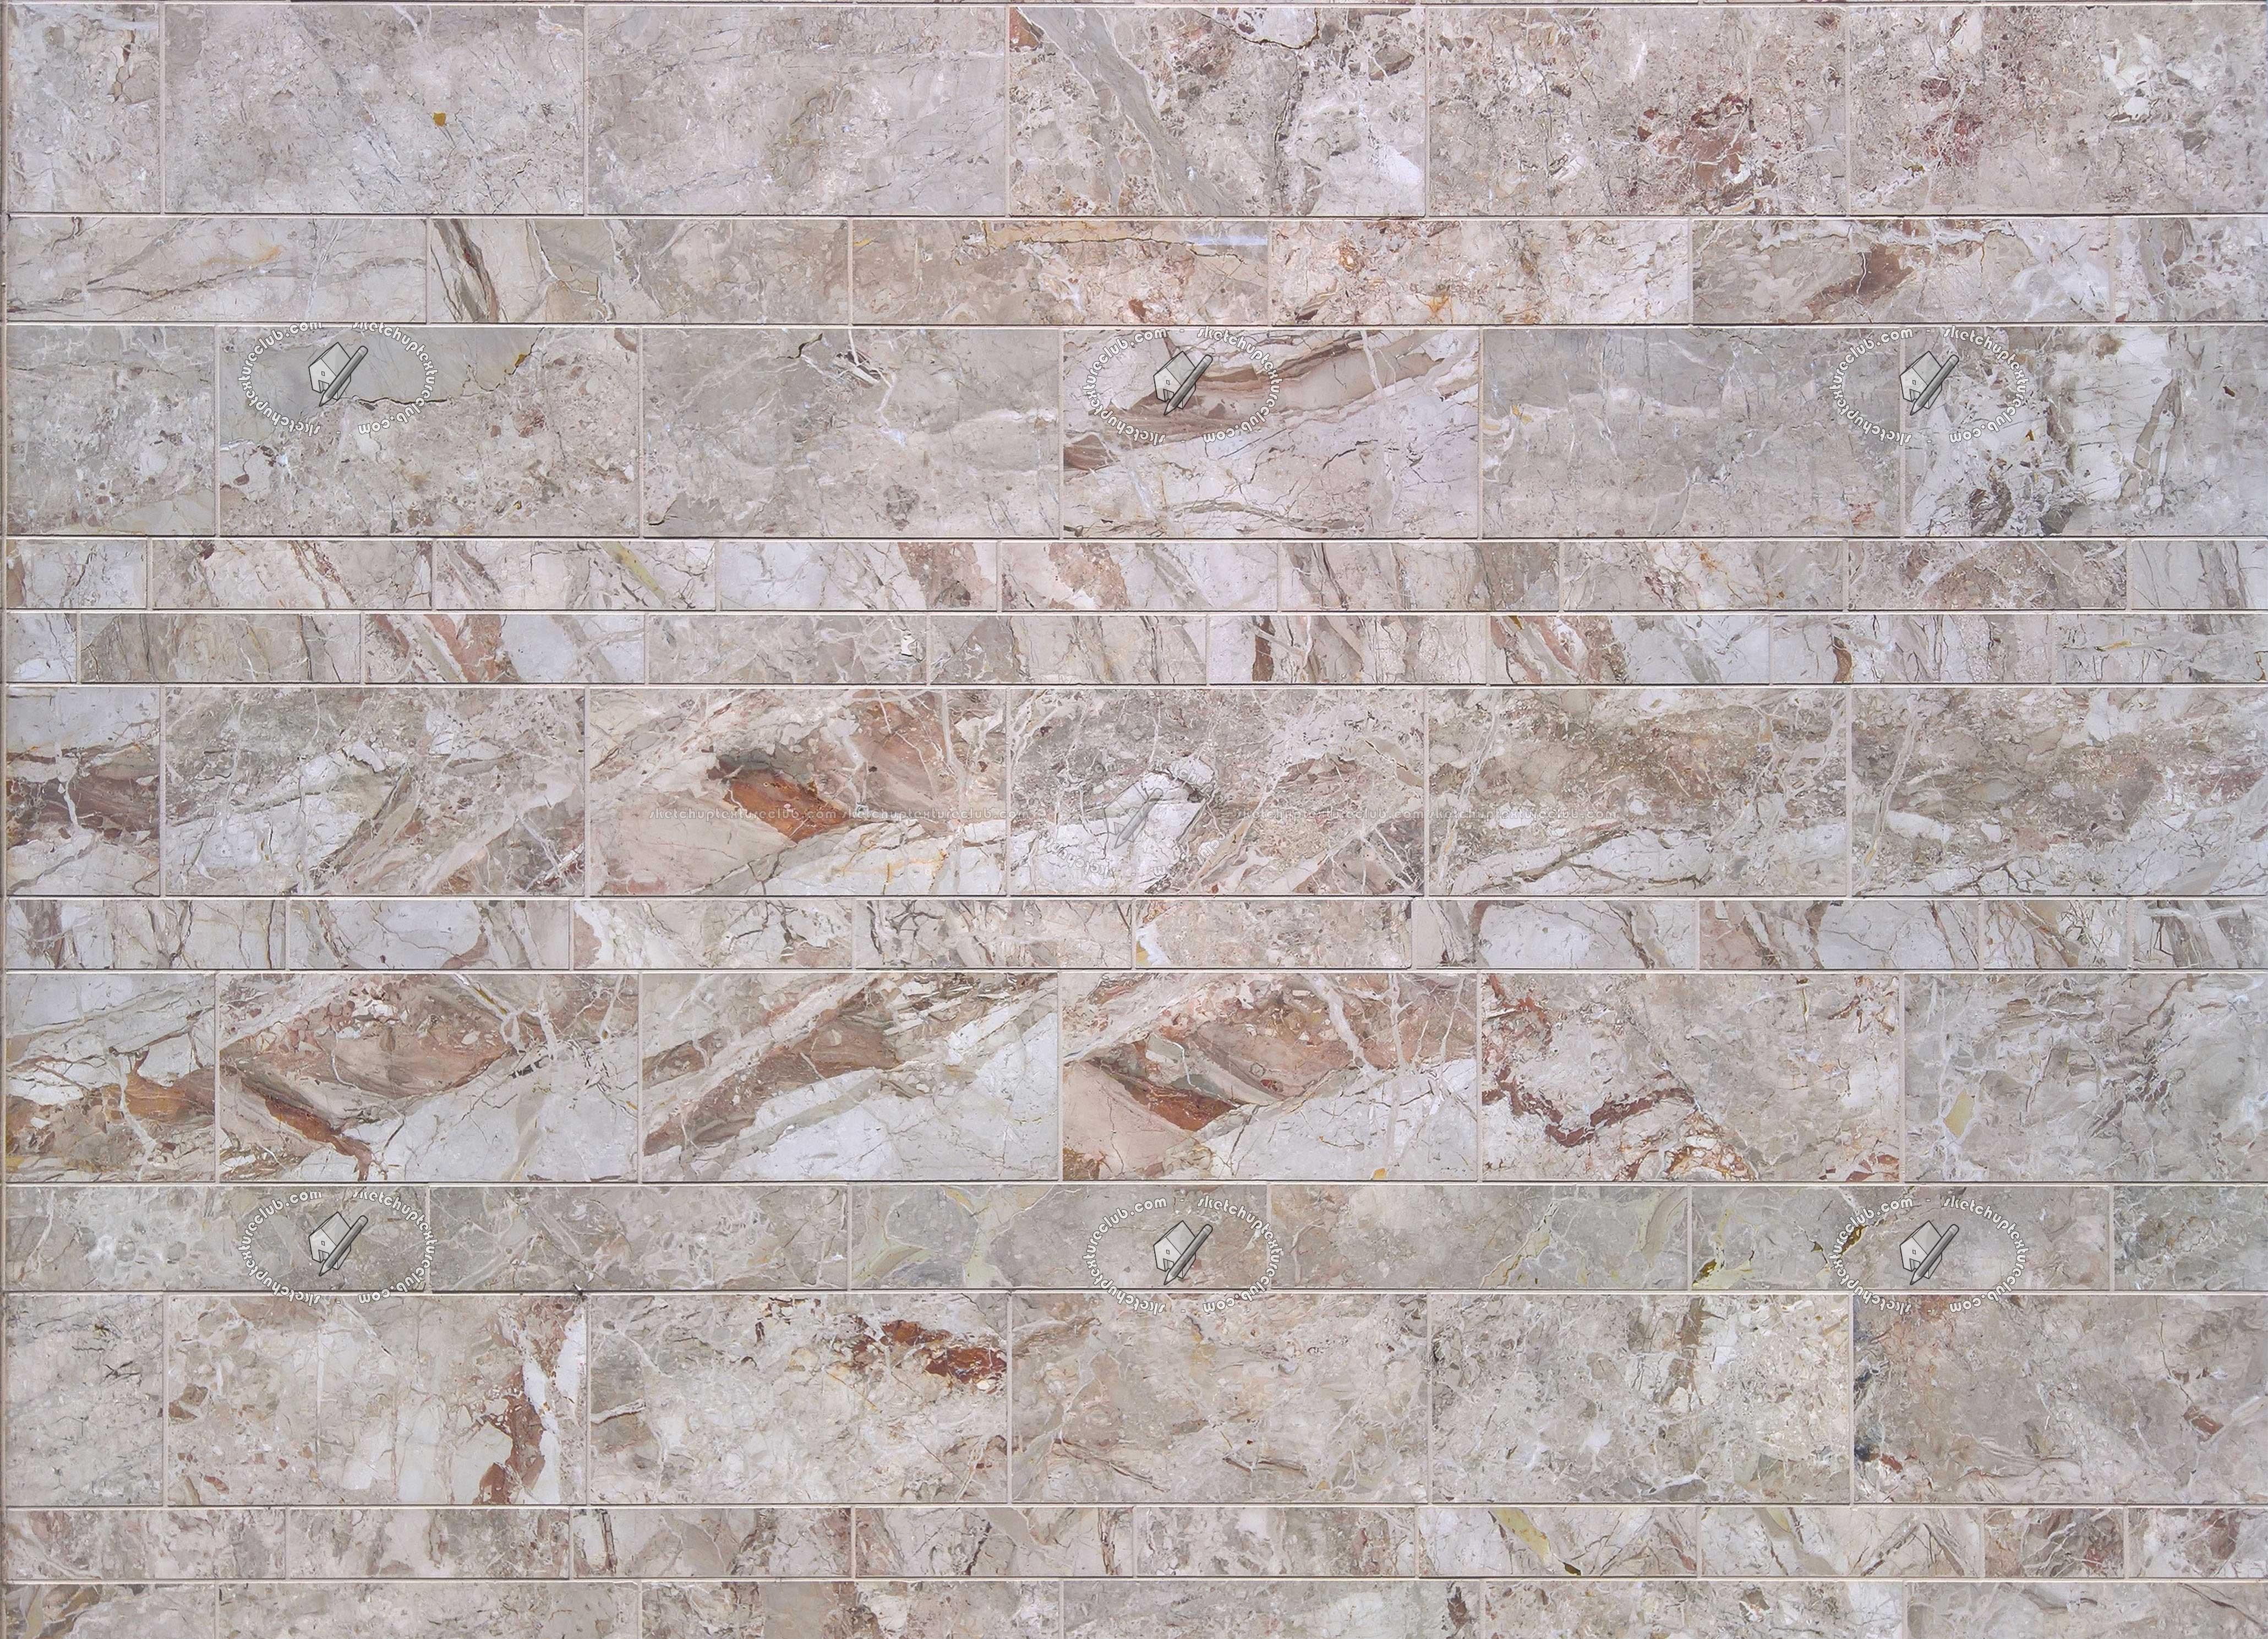 0004-marble-wall-cladding-texture-seamless-hr.jpg